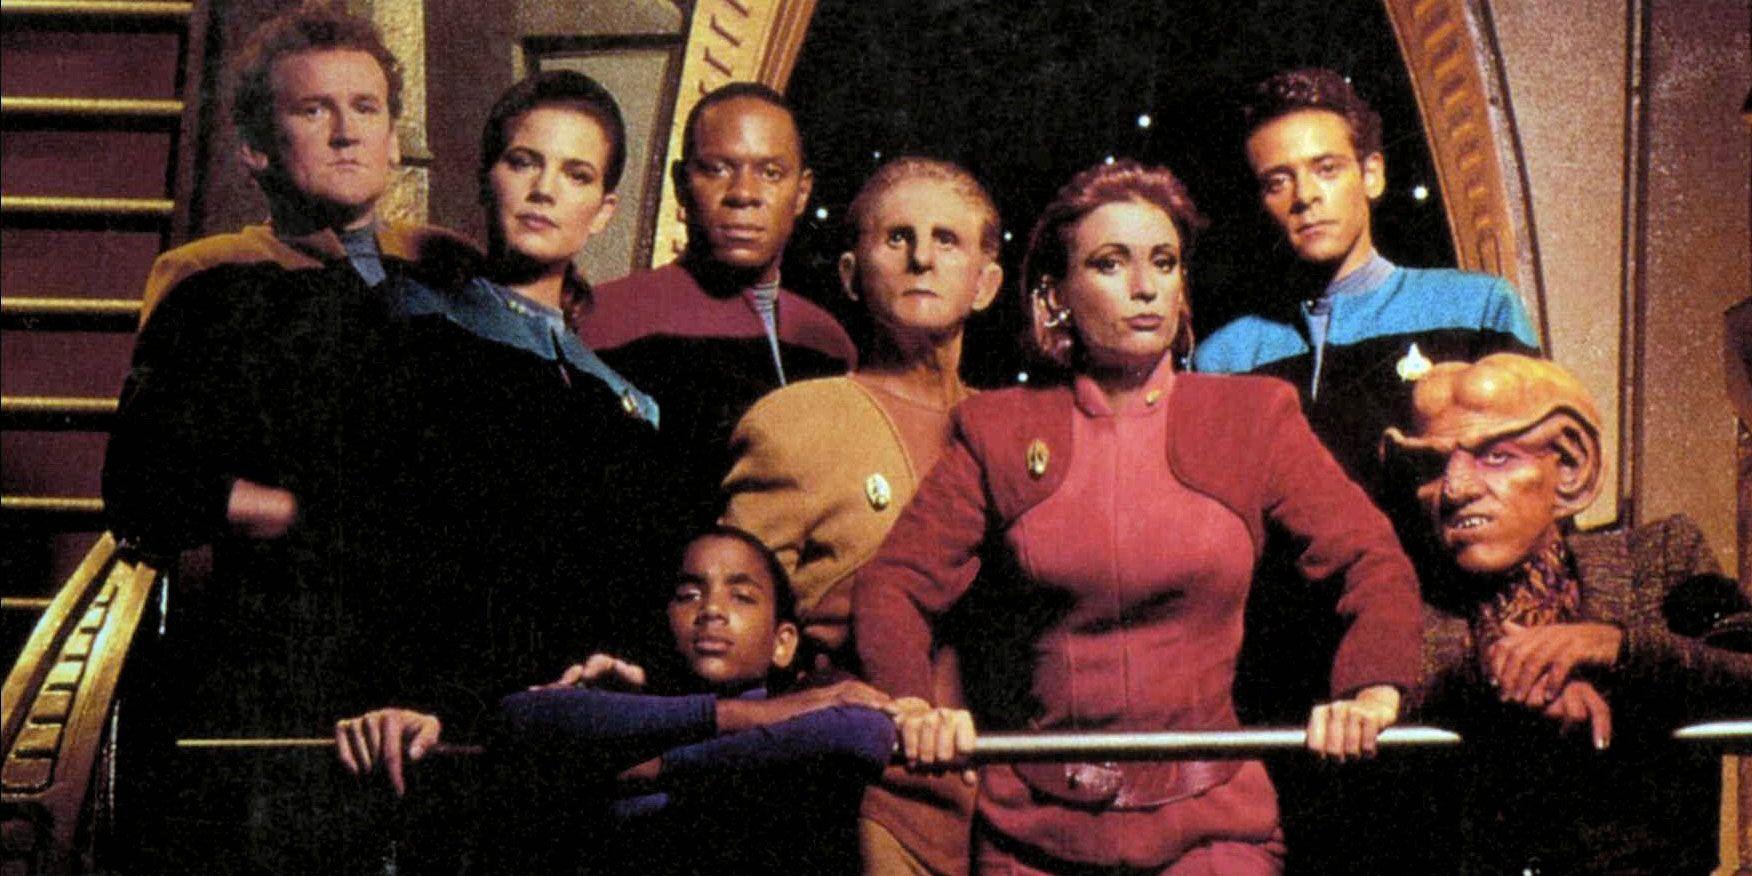 Star Trek's Greatest Episodic Sagas, Ranked